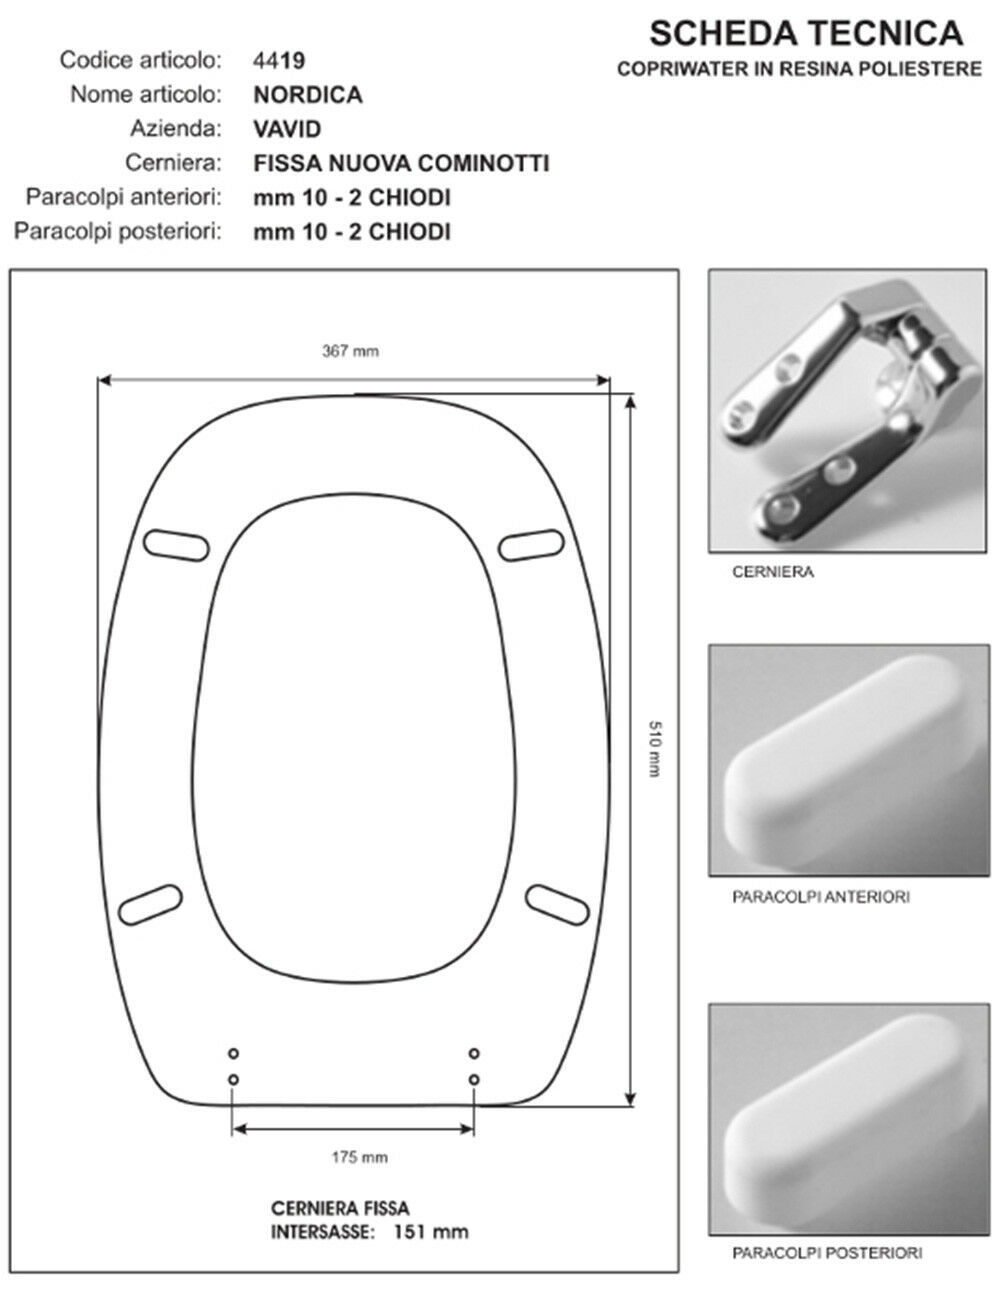 Abattant Wc Siège compatible avec Wc Nordica - - - céramique Vavid | De Gagner Une Grande Admiration  265234